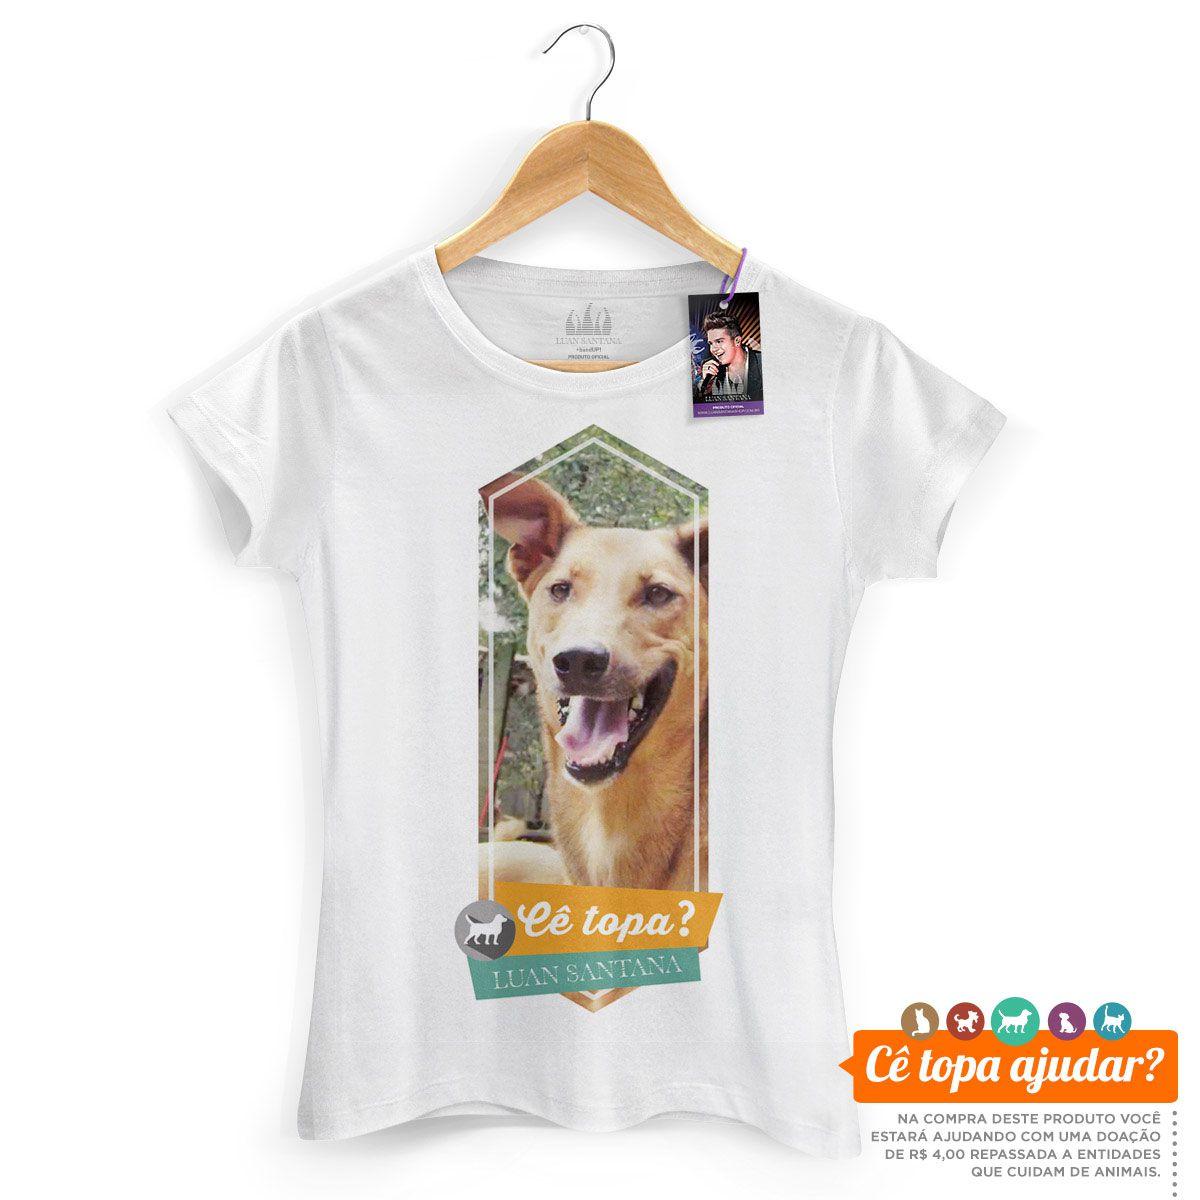 Camiseta Feminina Luan Santana Cê Topa Um Pastor?